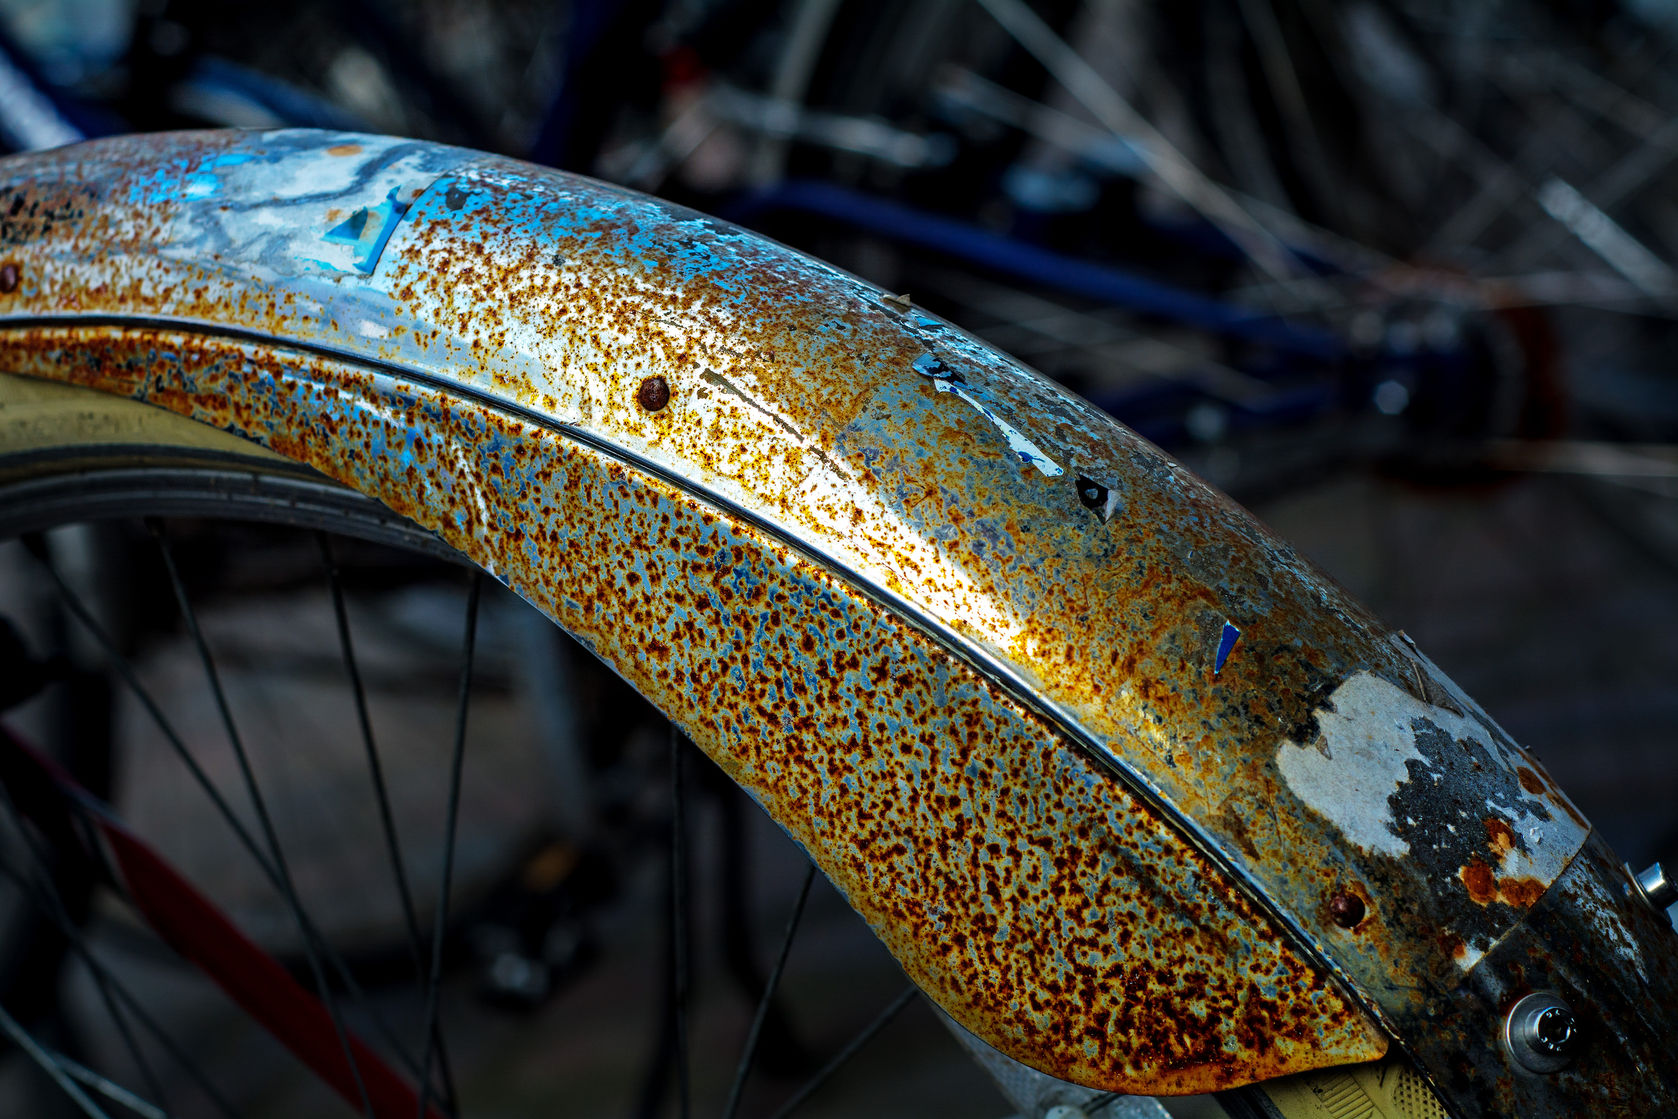 Aufkleber am Fahrrad entfernen